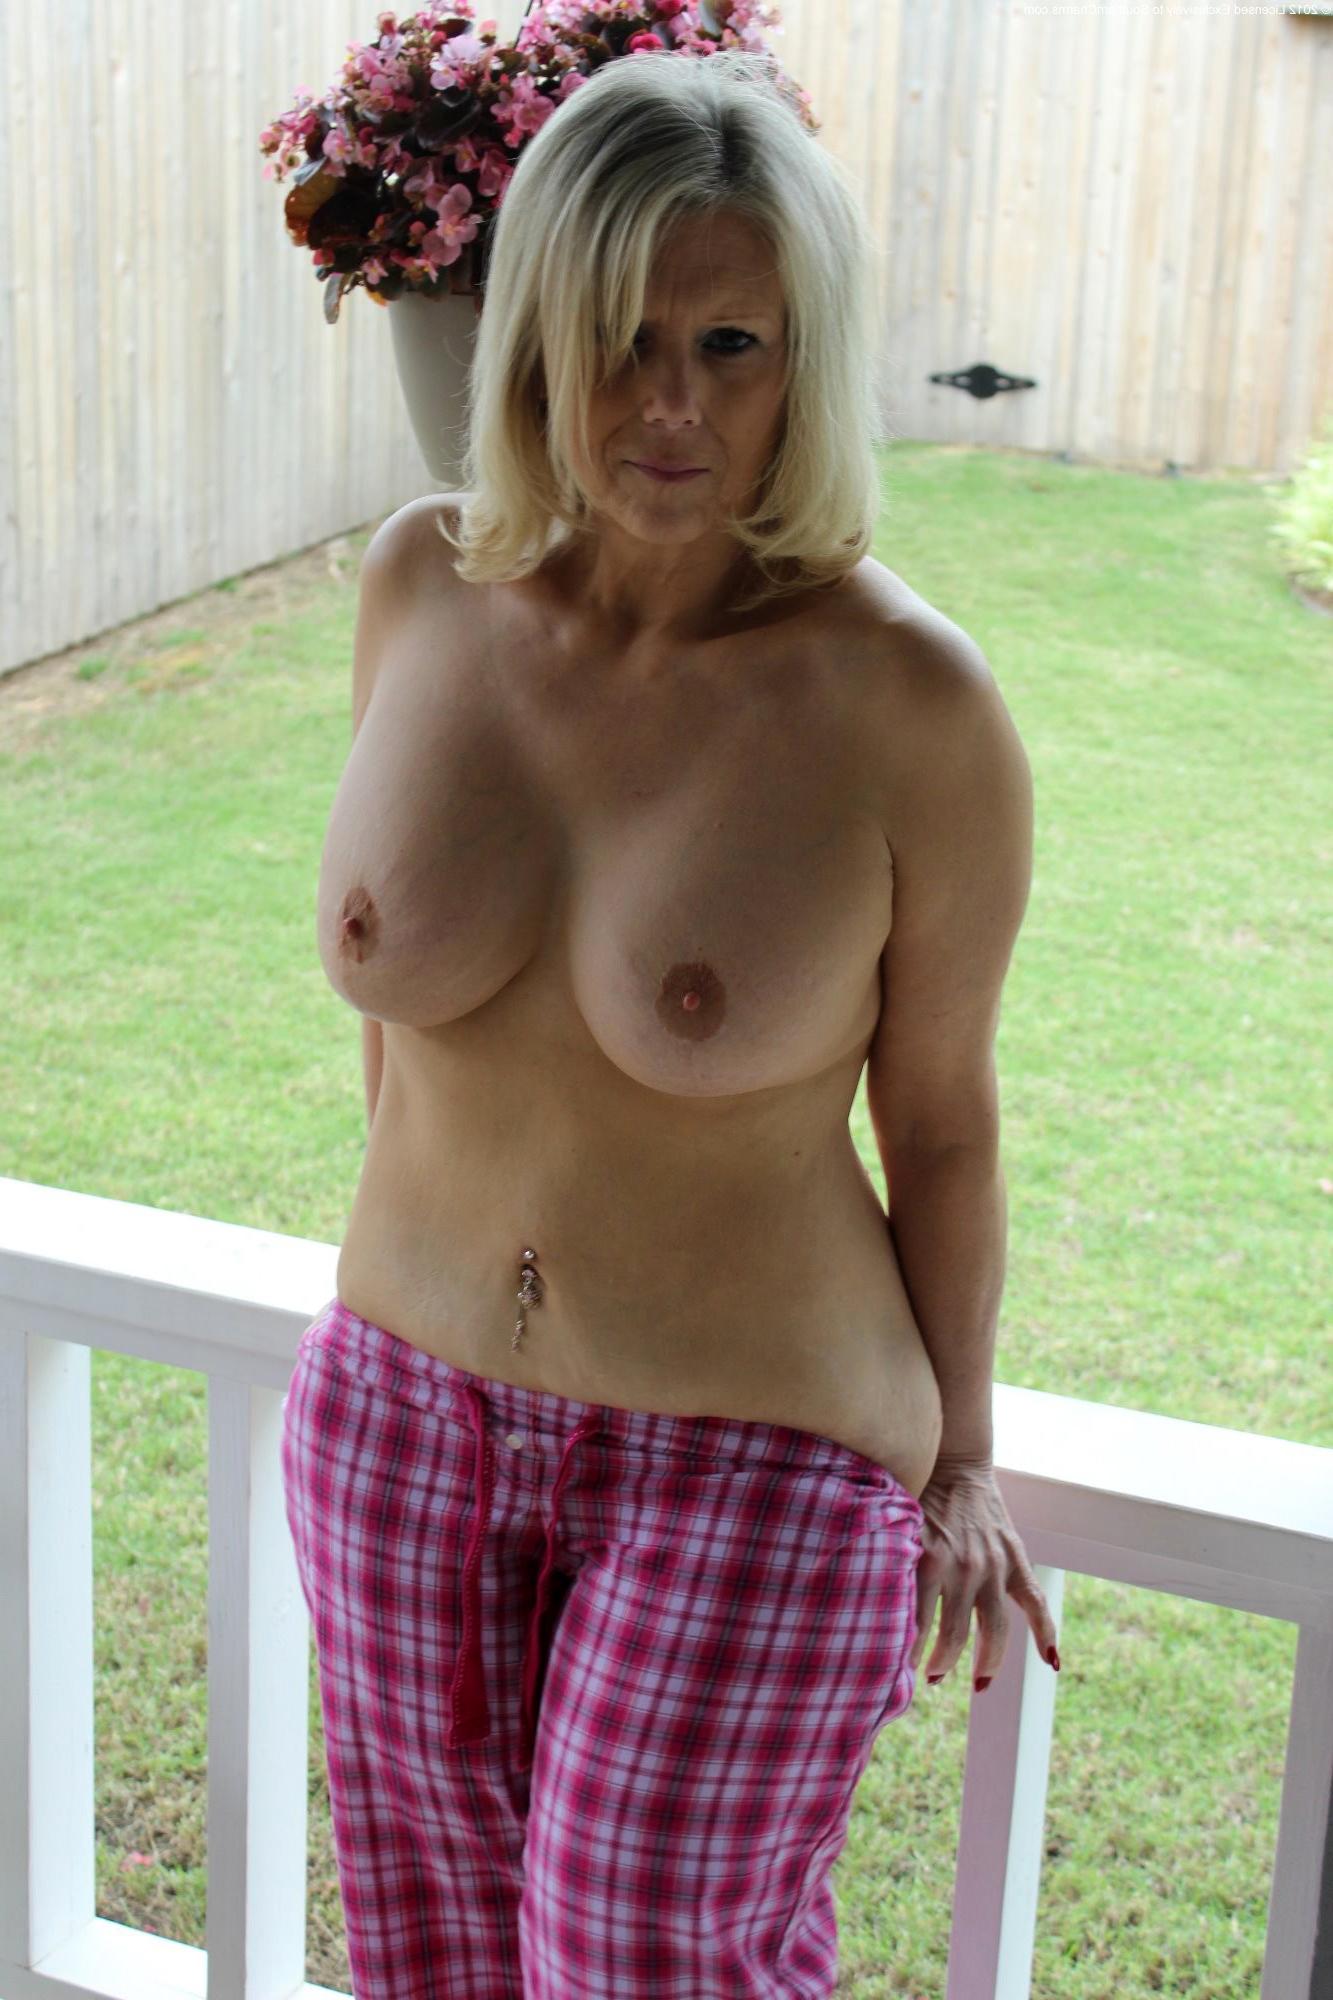 Outdoor porno mature Outdoor: 5,114